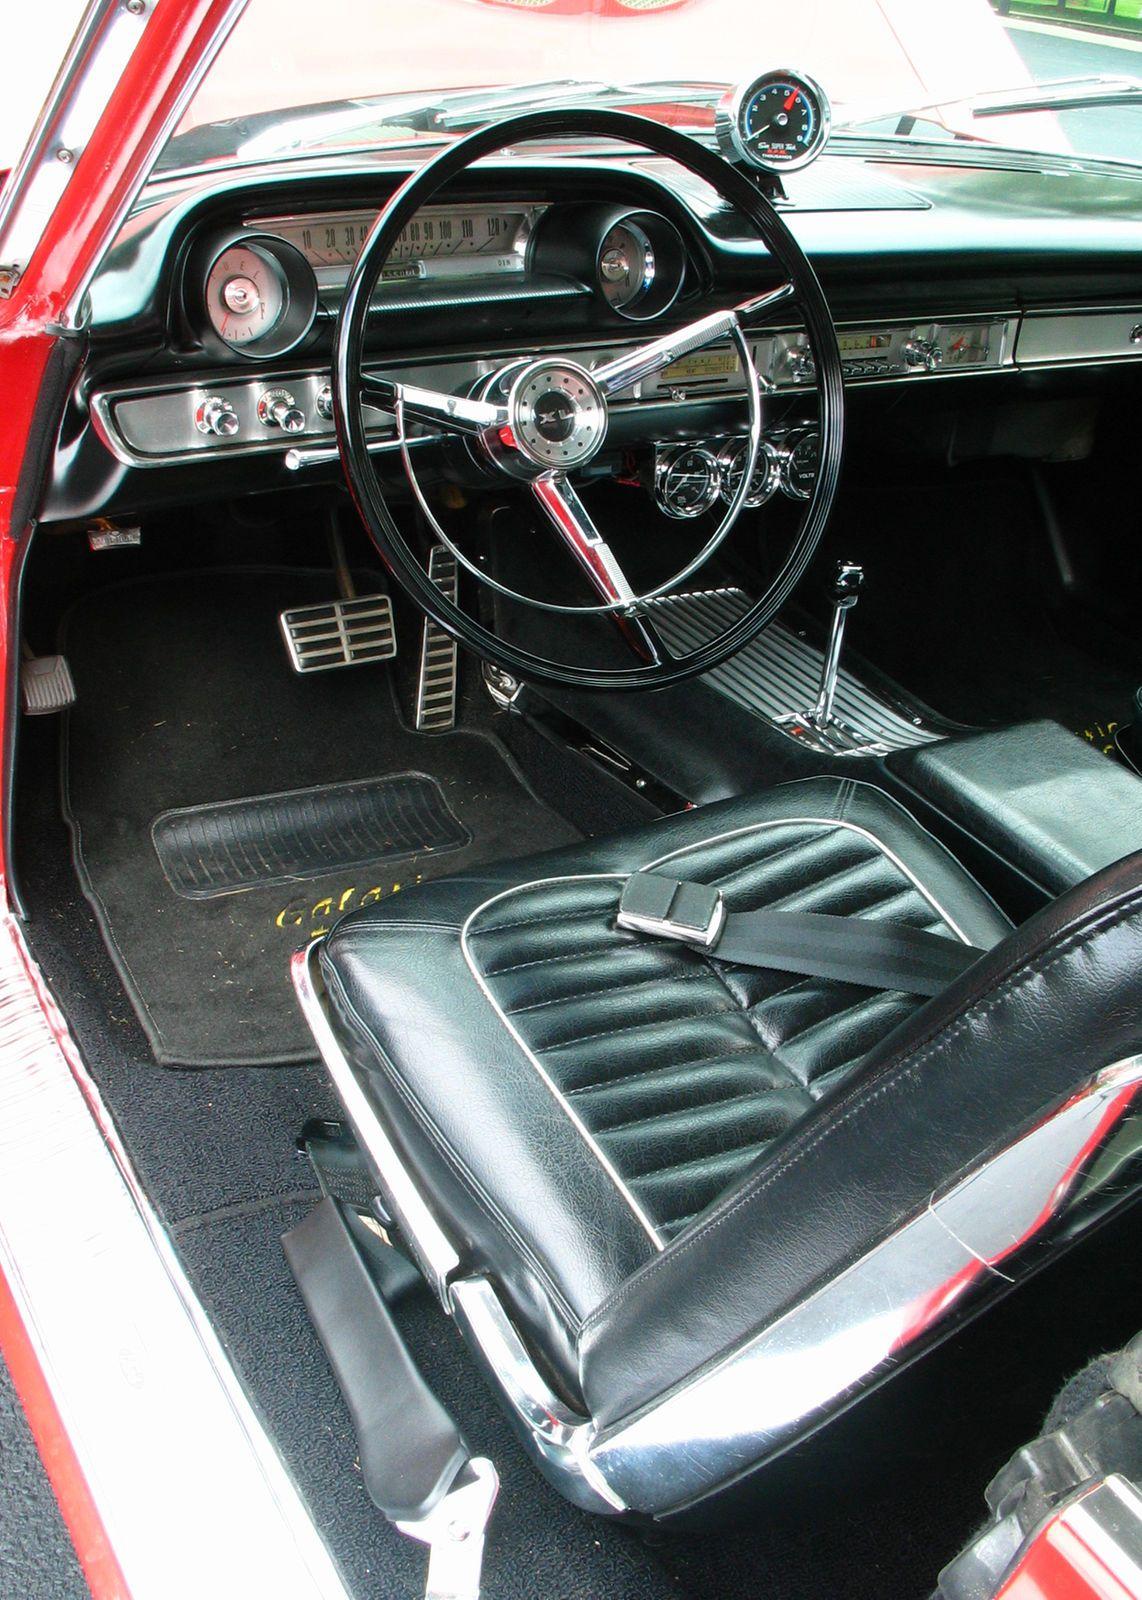 Jerry Ostalecki S 1964 Ford Galaxie 500xl Is An Engine Swap Car